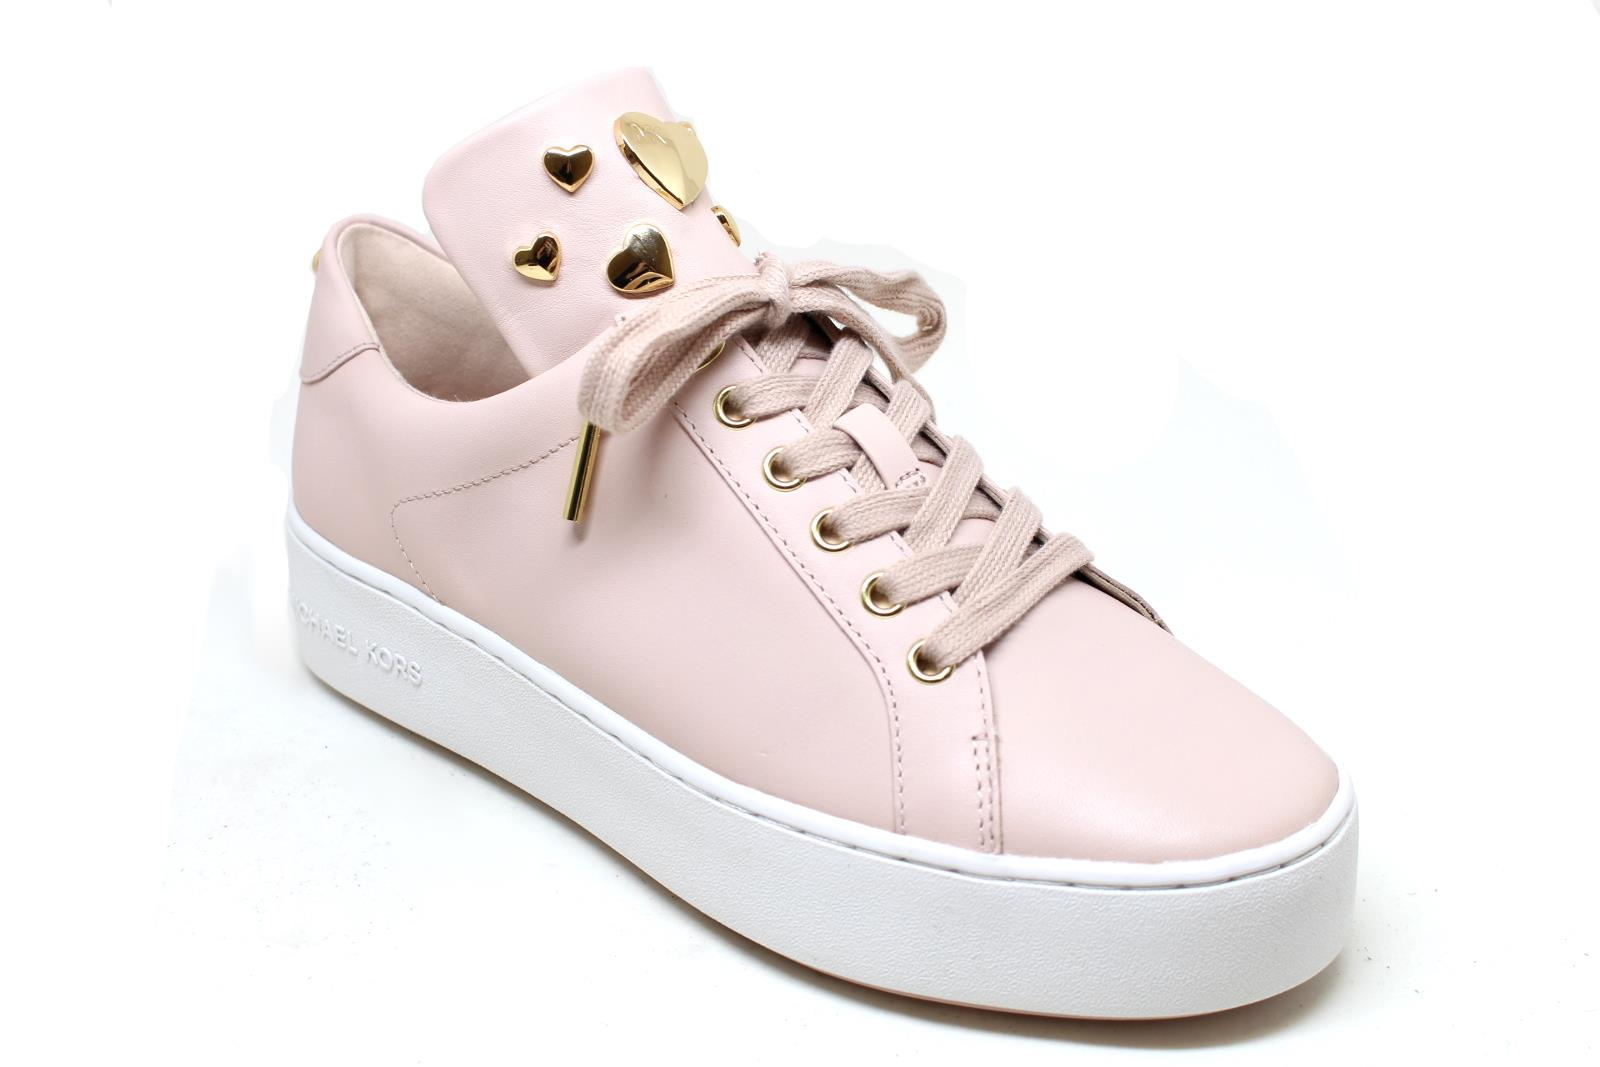 68db2726ec5f Michael Kors Sneaker mindy lace up